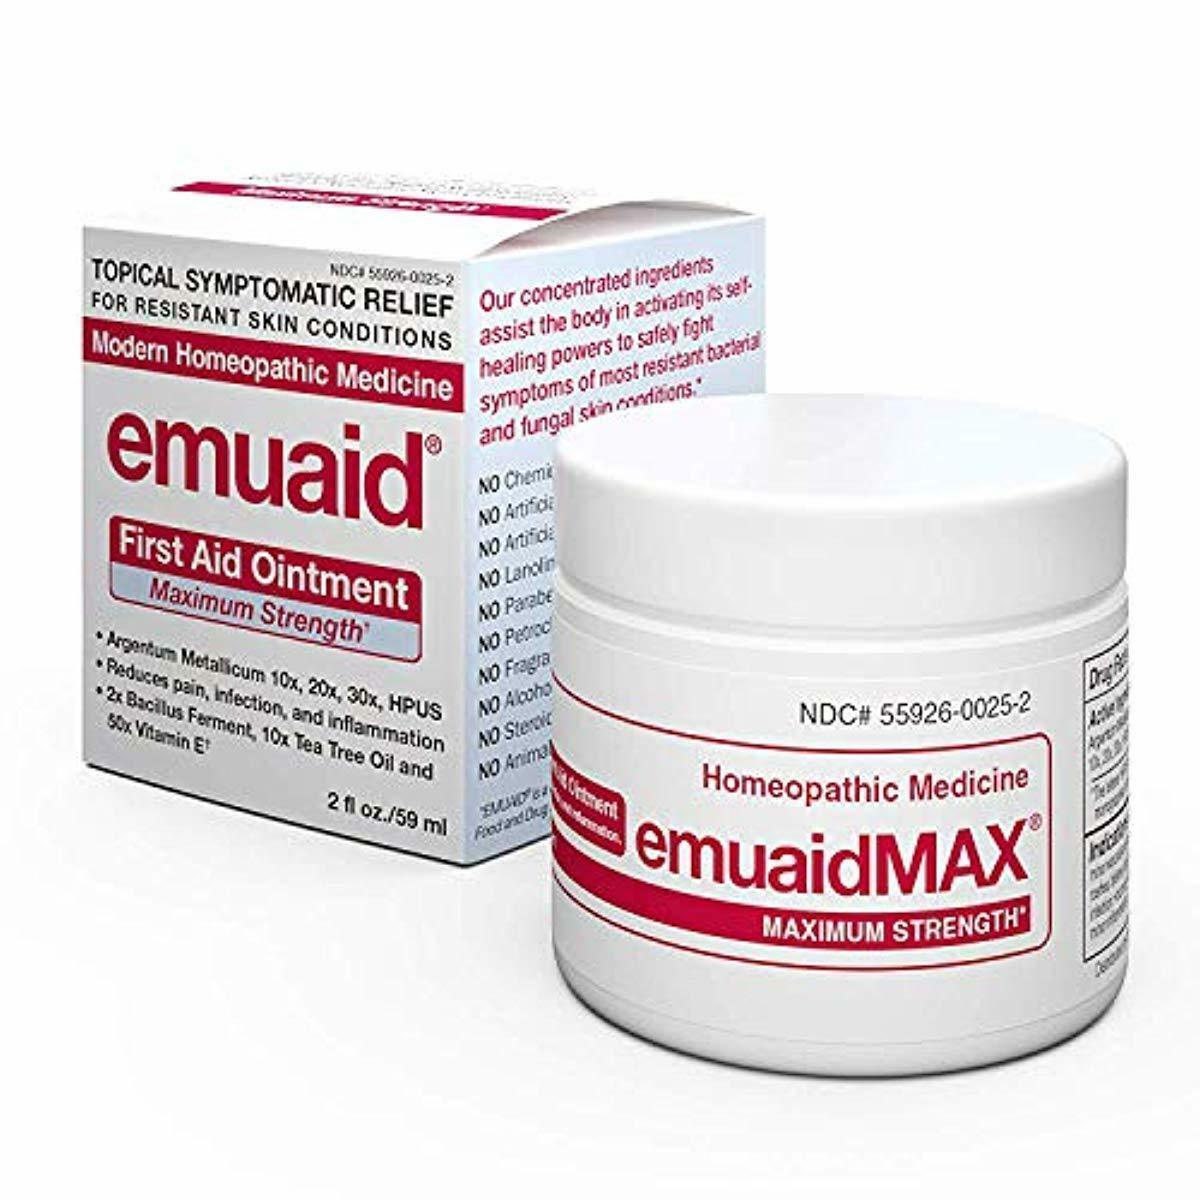 EmuaidMAX® Ointment - Antifungal, Eczema Cream. Maximum Str